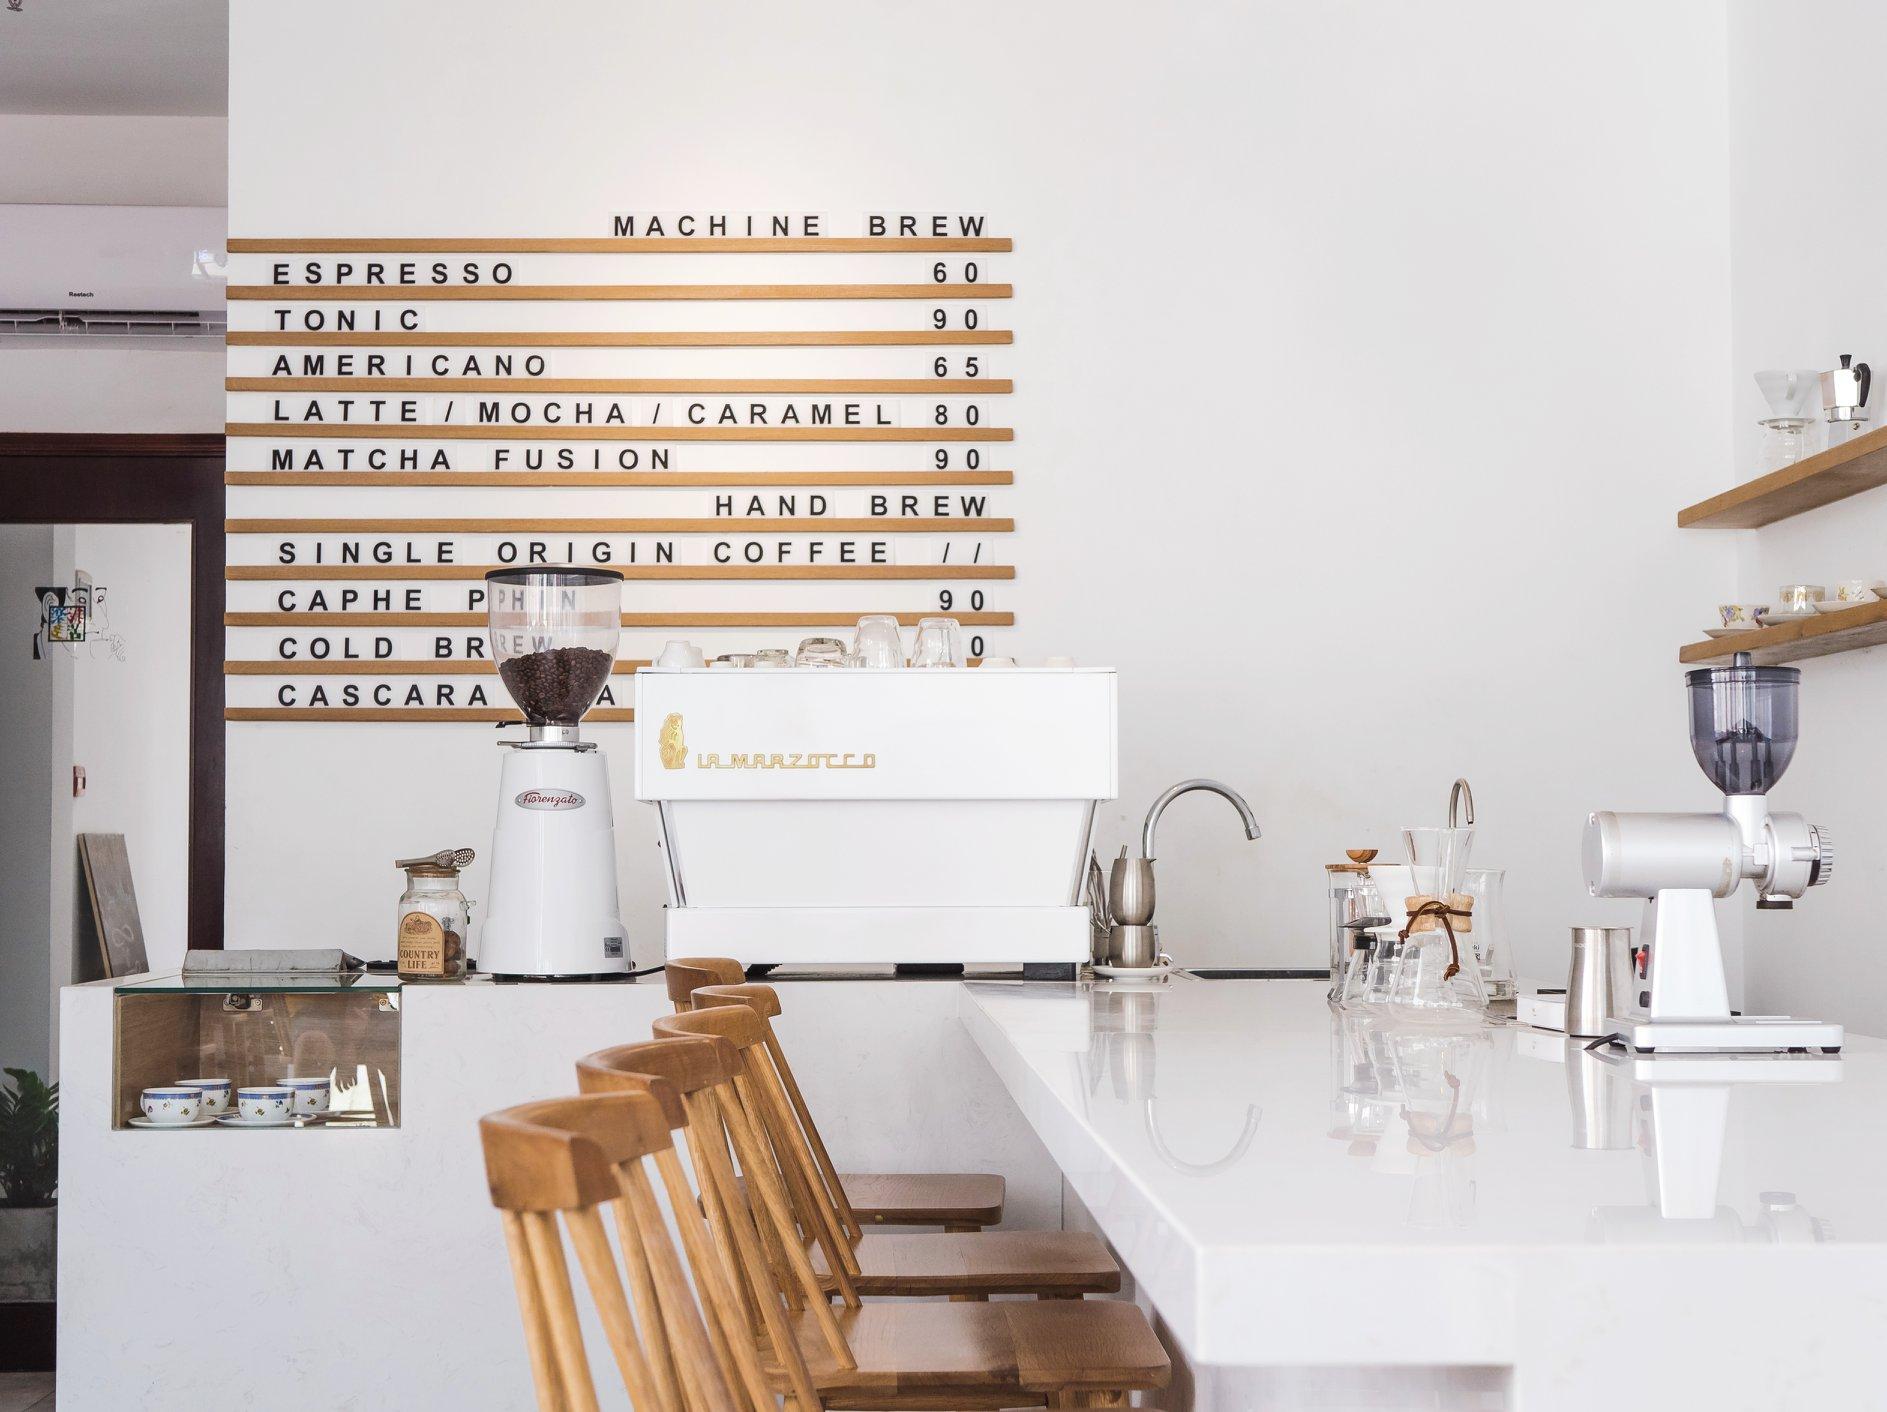 sai-gon-cafe-dep-tai-sai-gon-infinity-coffee-1